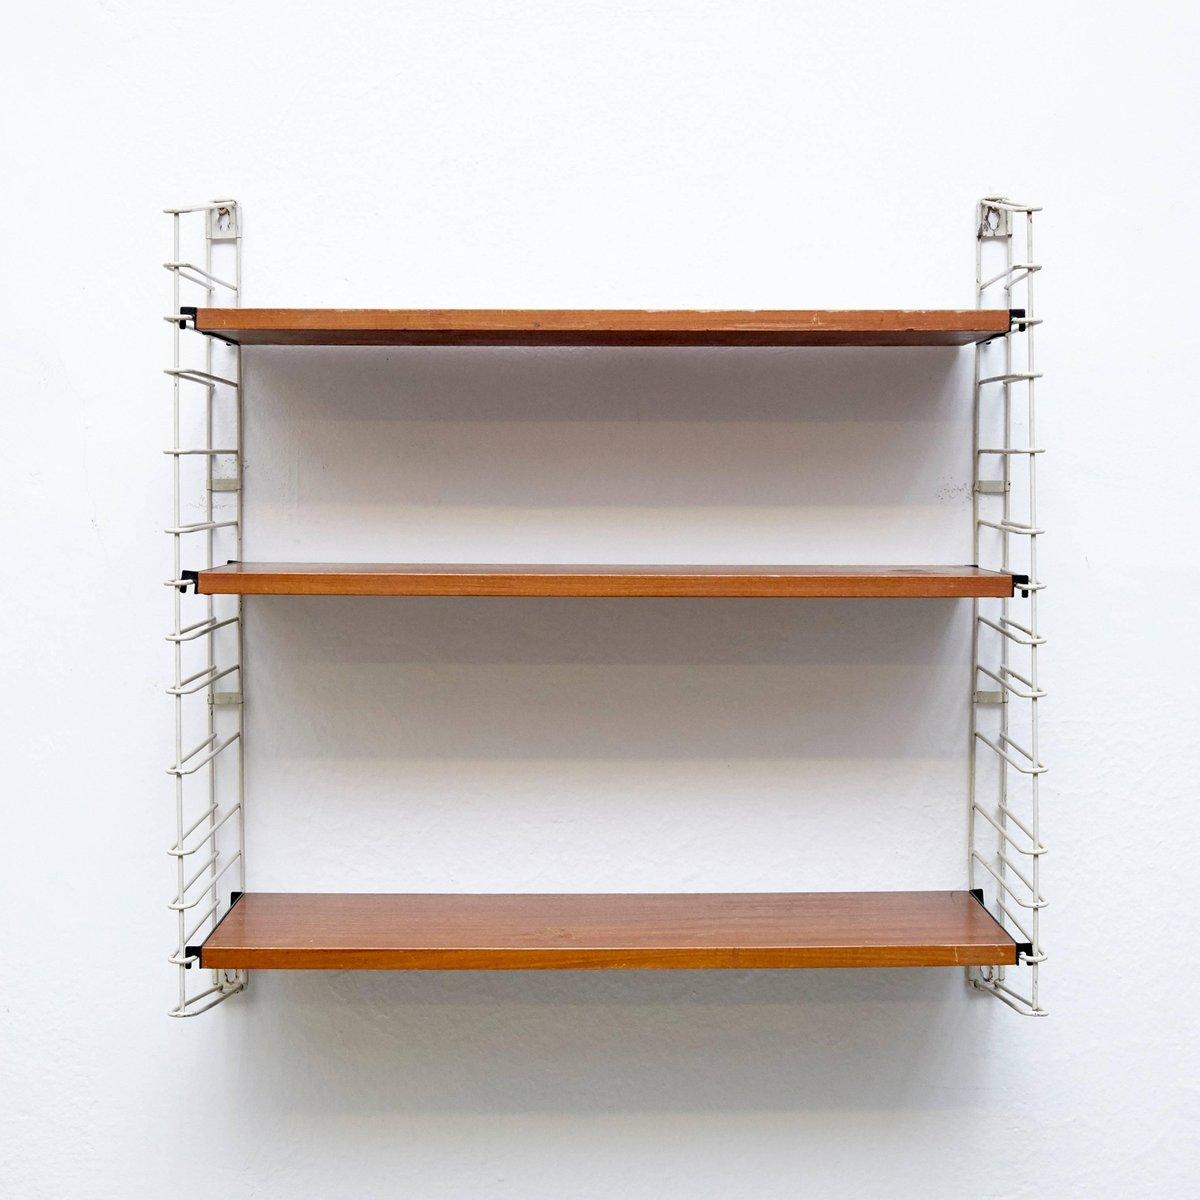 Modular Wall Hanging Shelf By Adriaan Dekker For Tomado 1960s